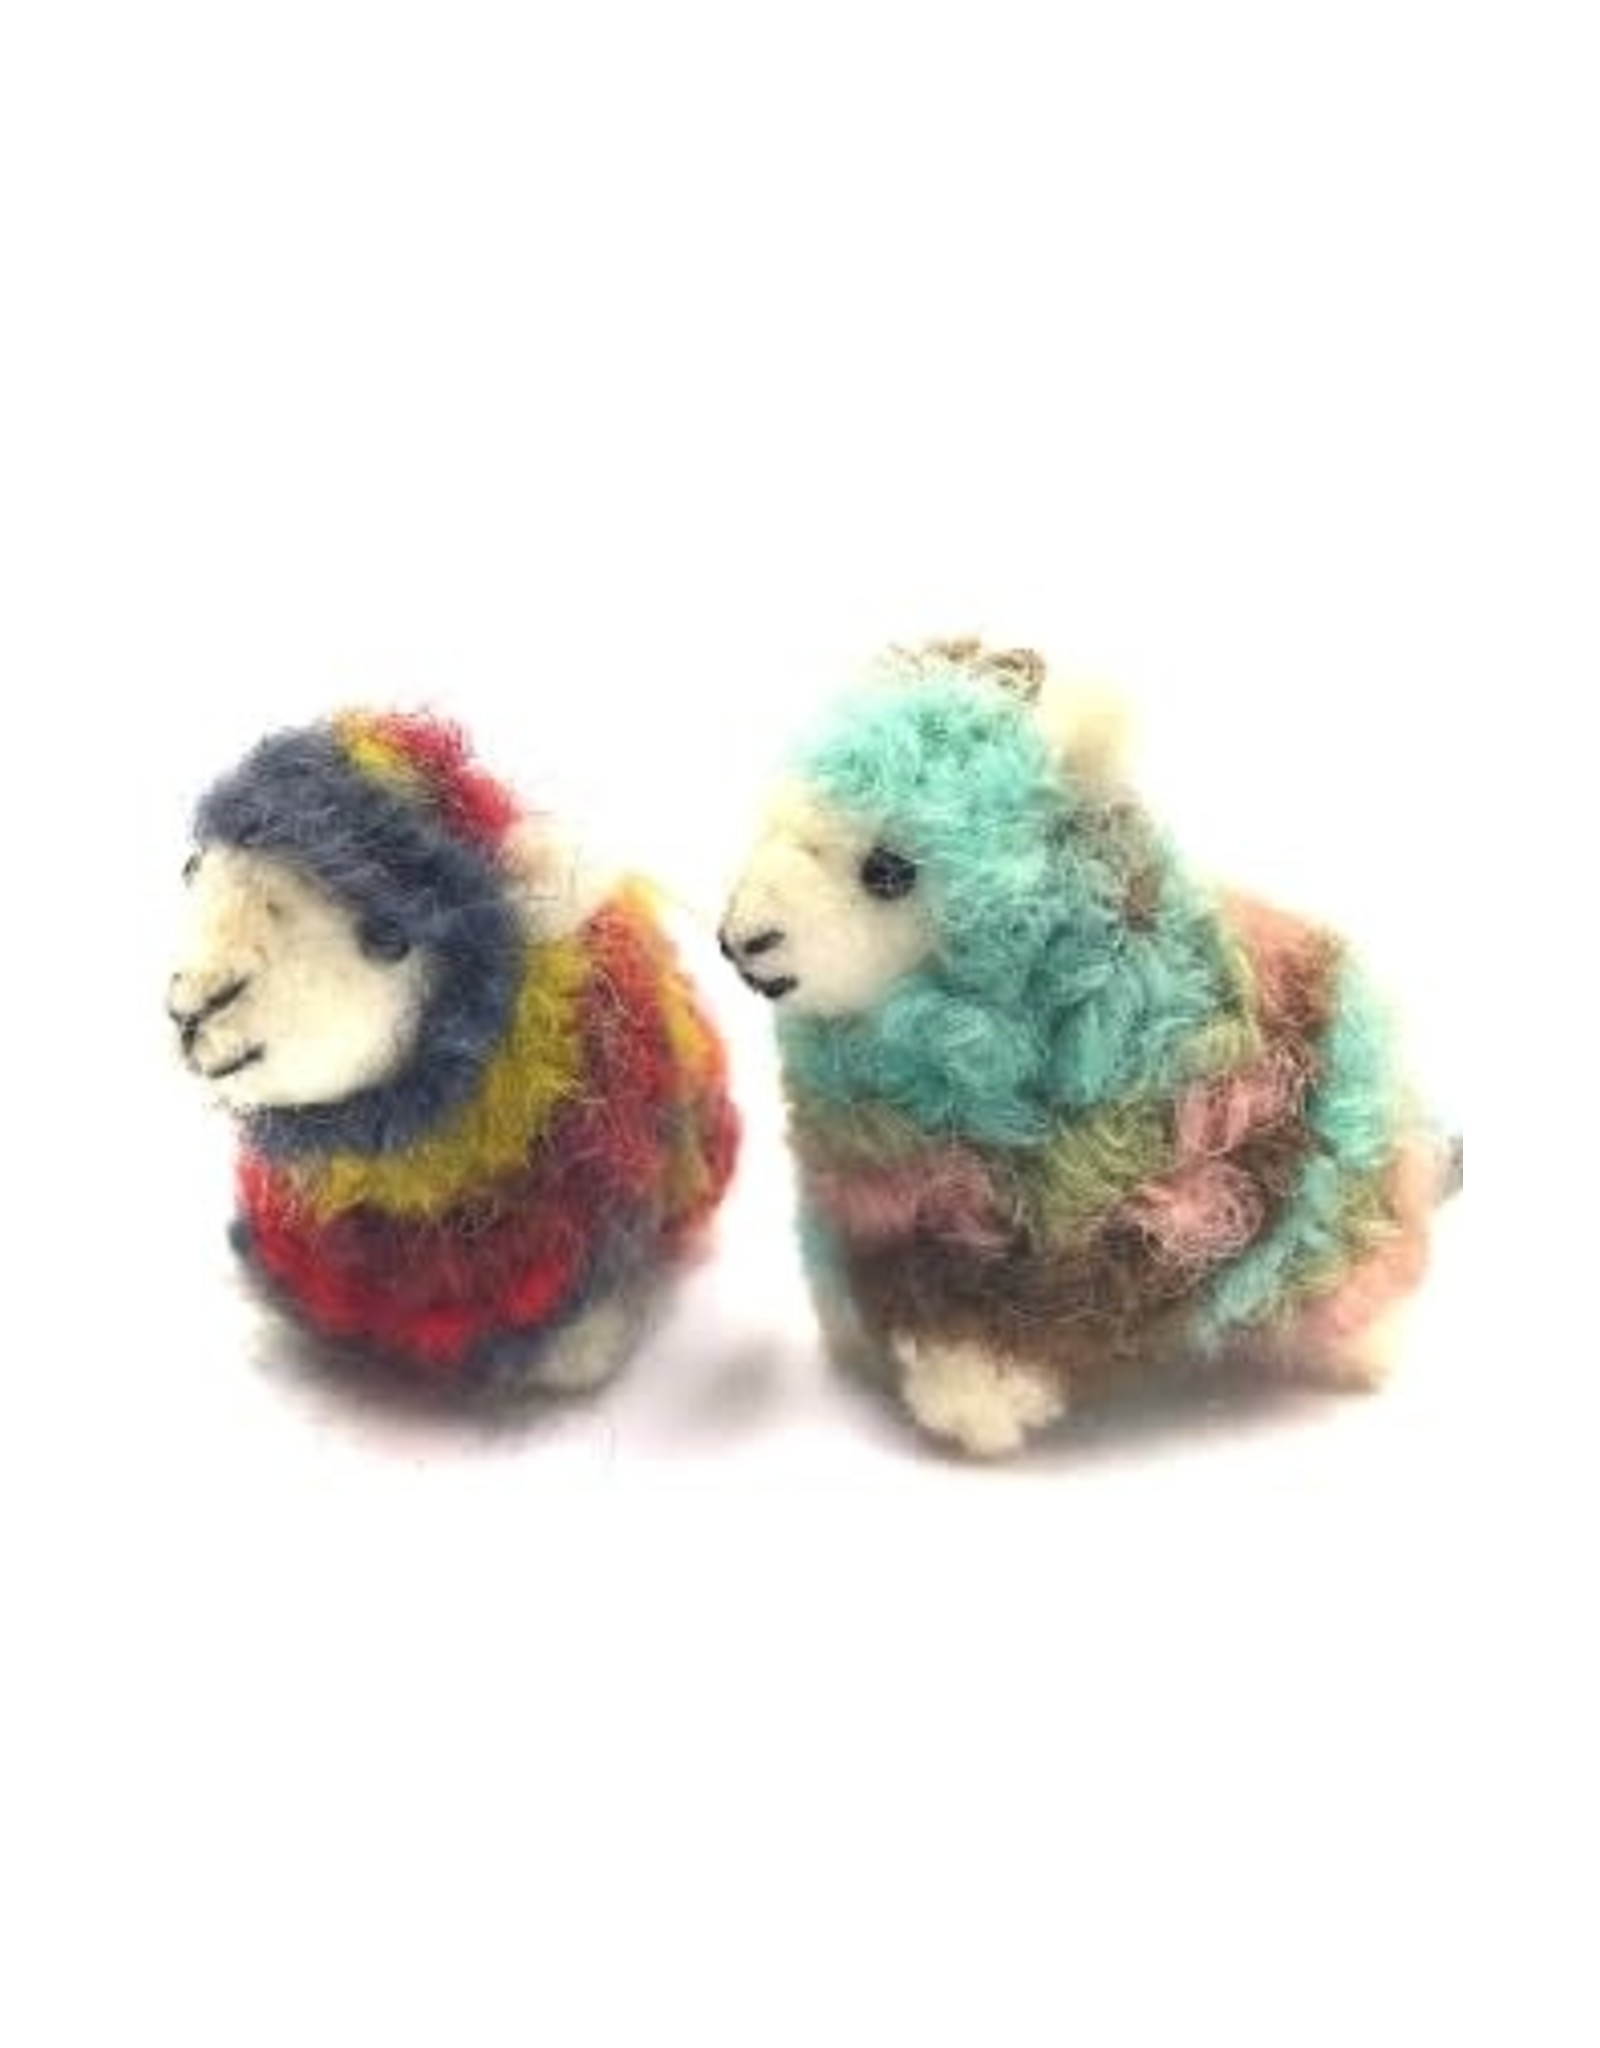 Ganesh Himal Rainbow Mini Sheep Ornament, assorted, Nepal